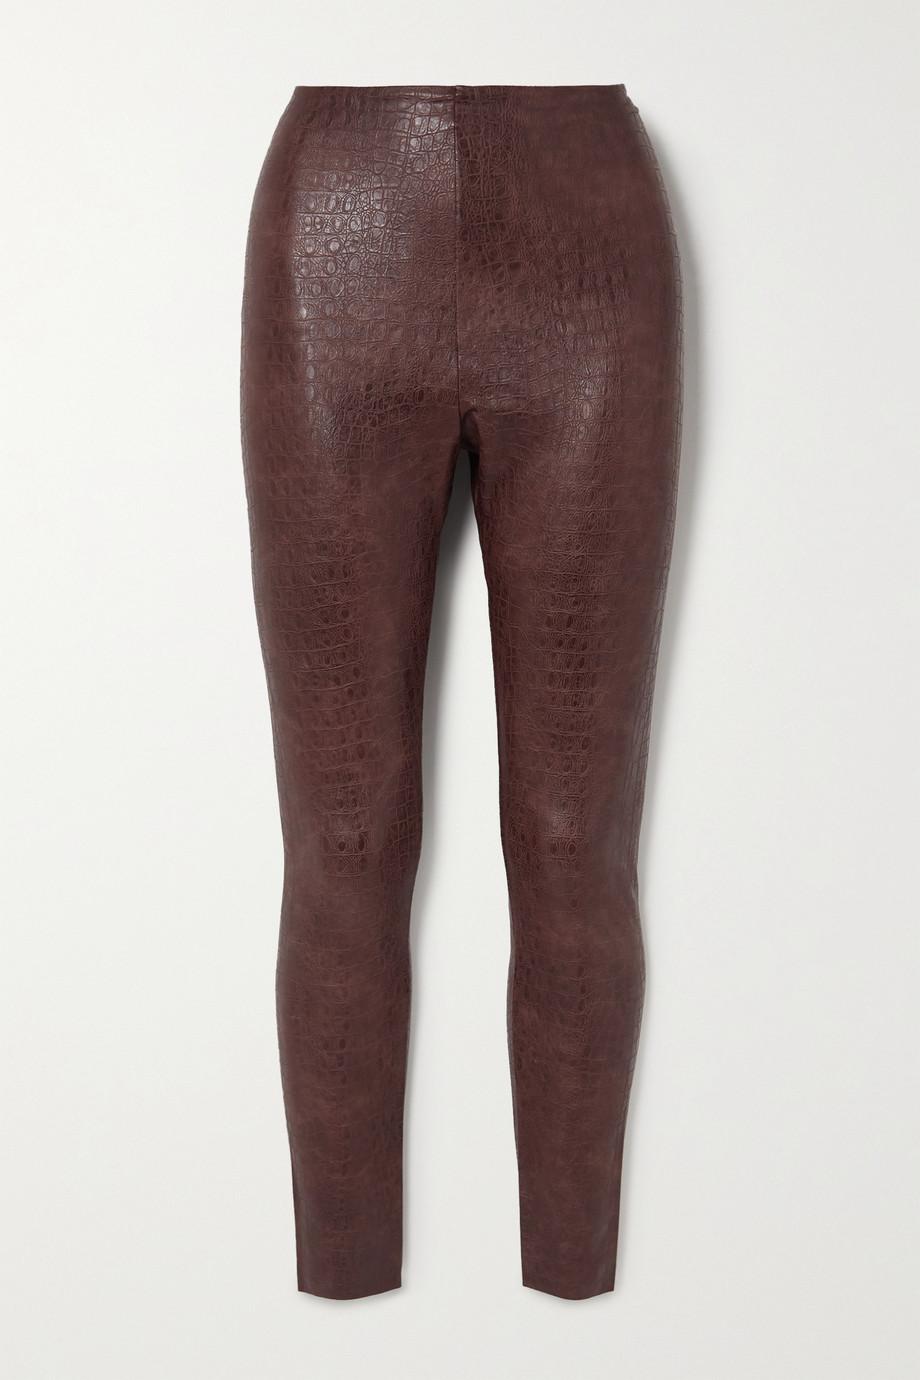 Commando Stretch faux croc-effect leather leggings